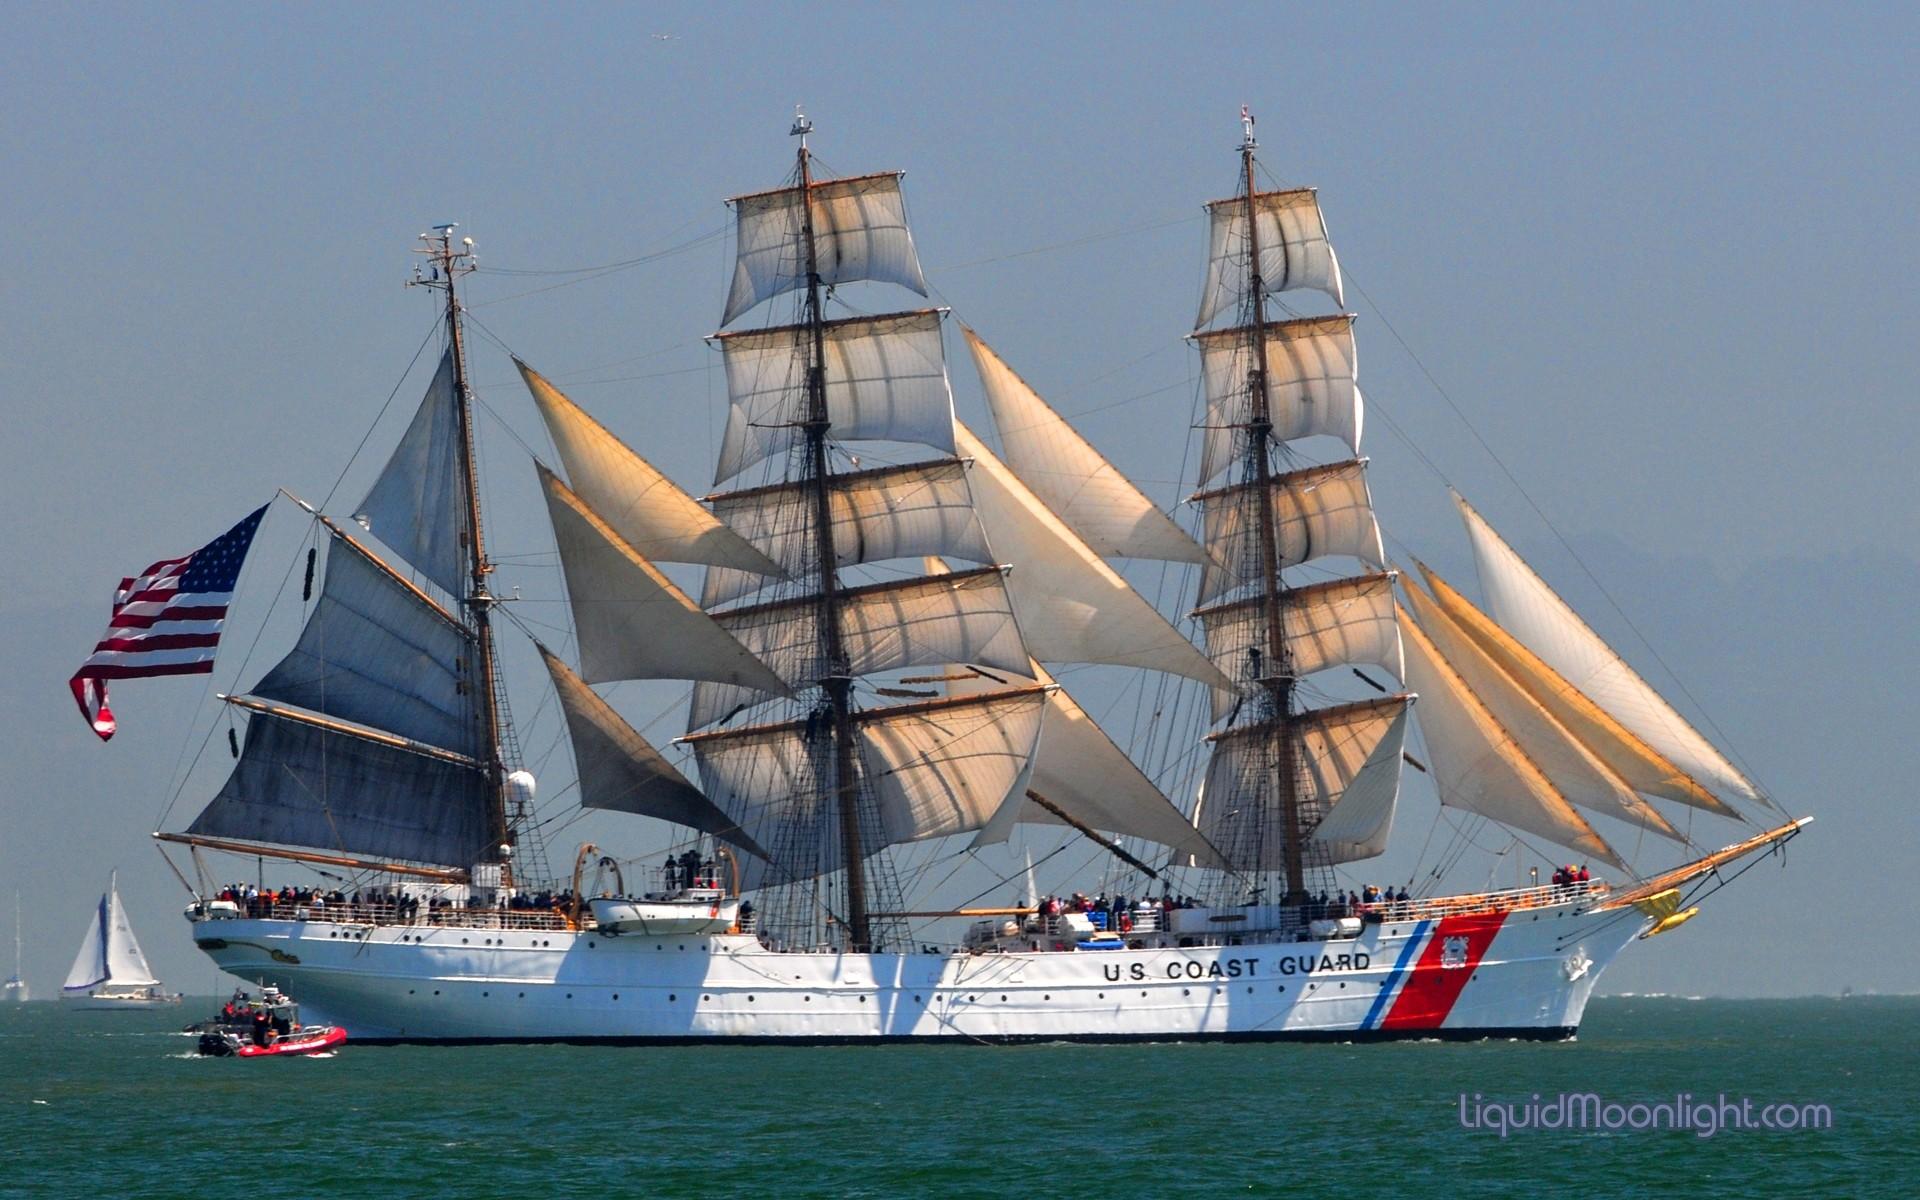 United-States-Coast-Guard-Cutter-Barque-Eagle-in-